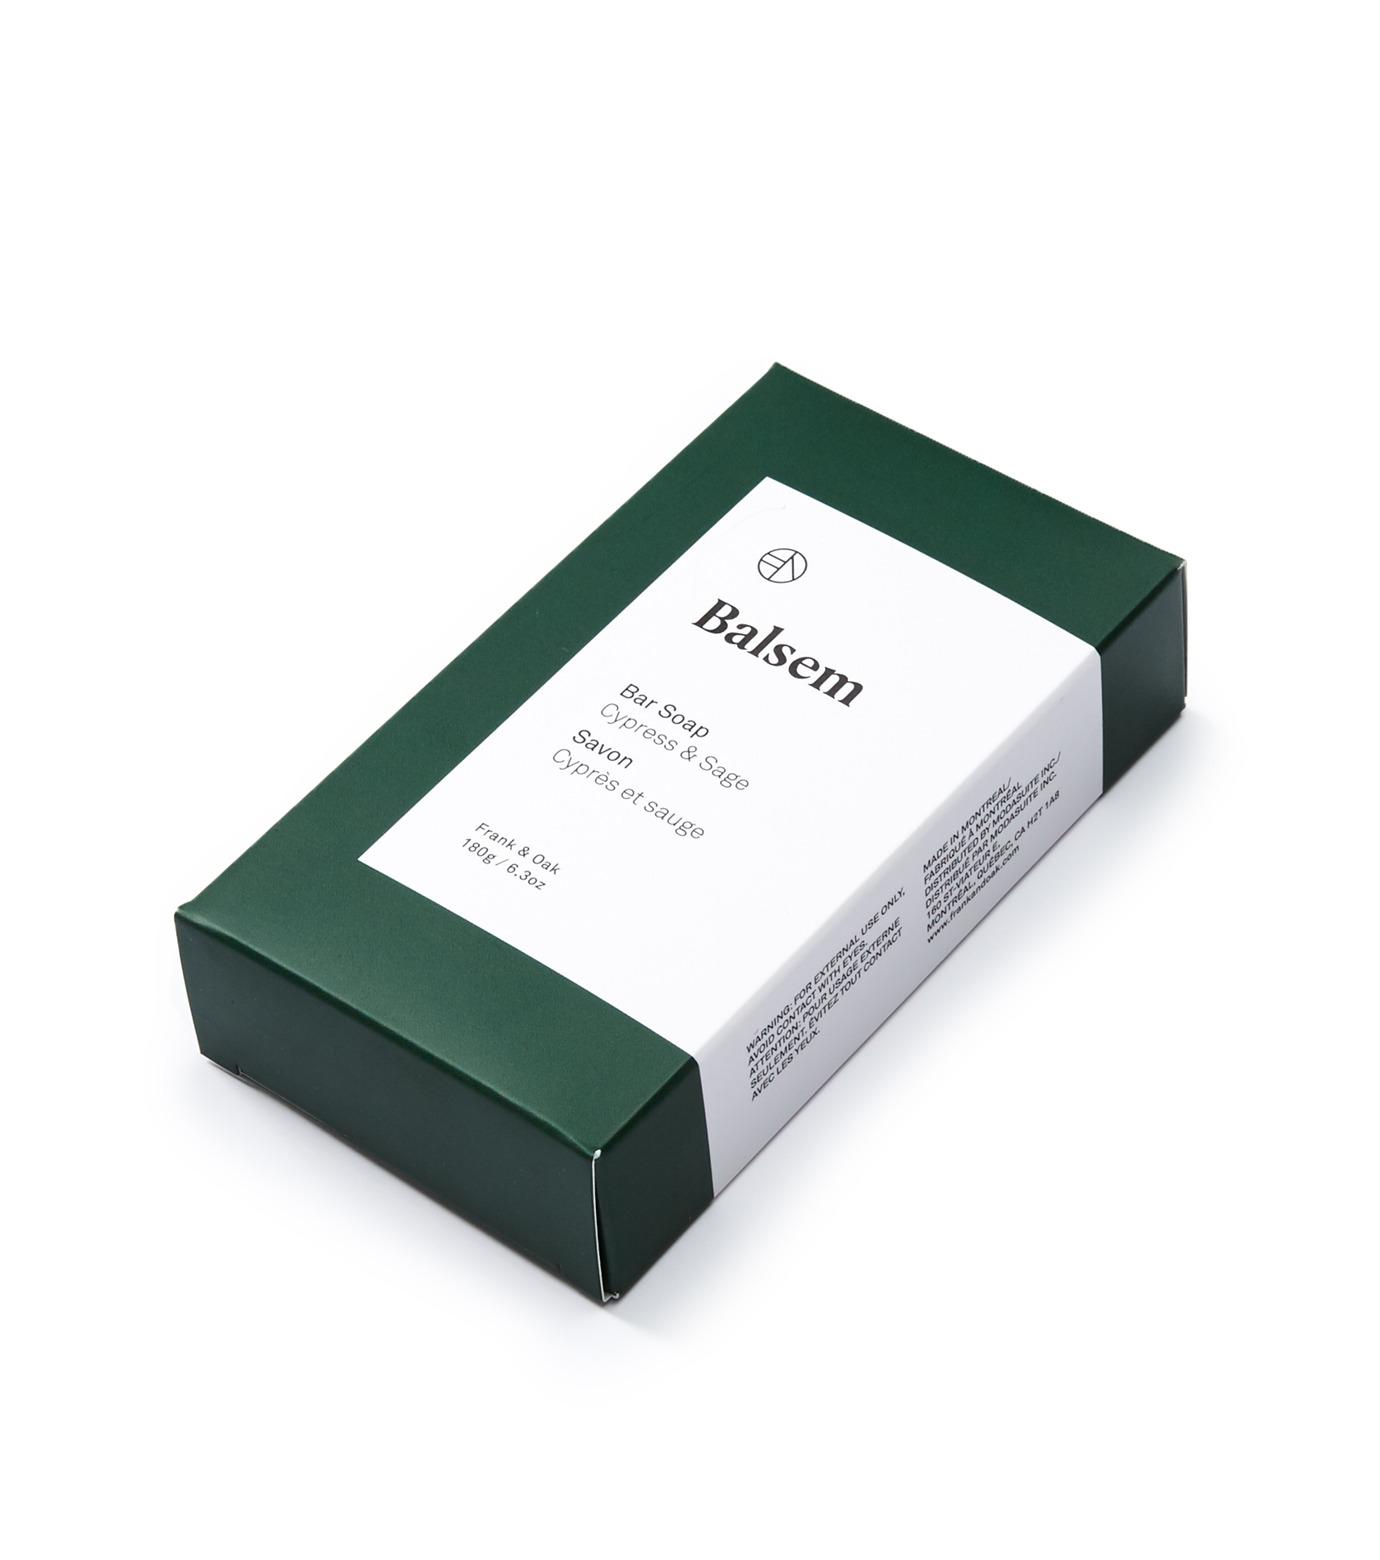 BALSEM()のBAR SOAP C/S 180g-WHITE(BATH-BODY-GROOMING/BATH-BODY-GROOMING)-MS-31031B-4 拡大詳細画像3